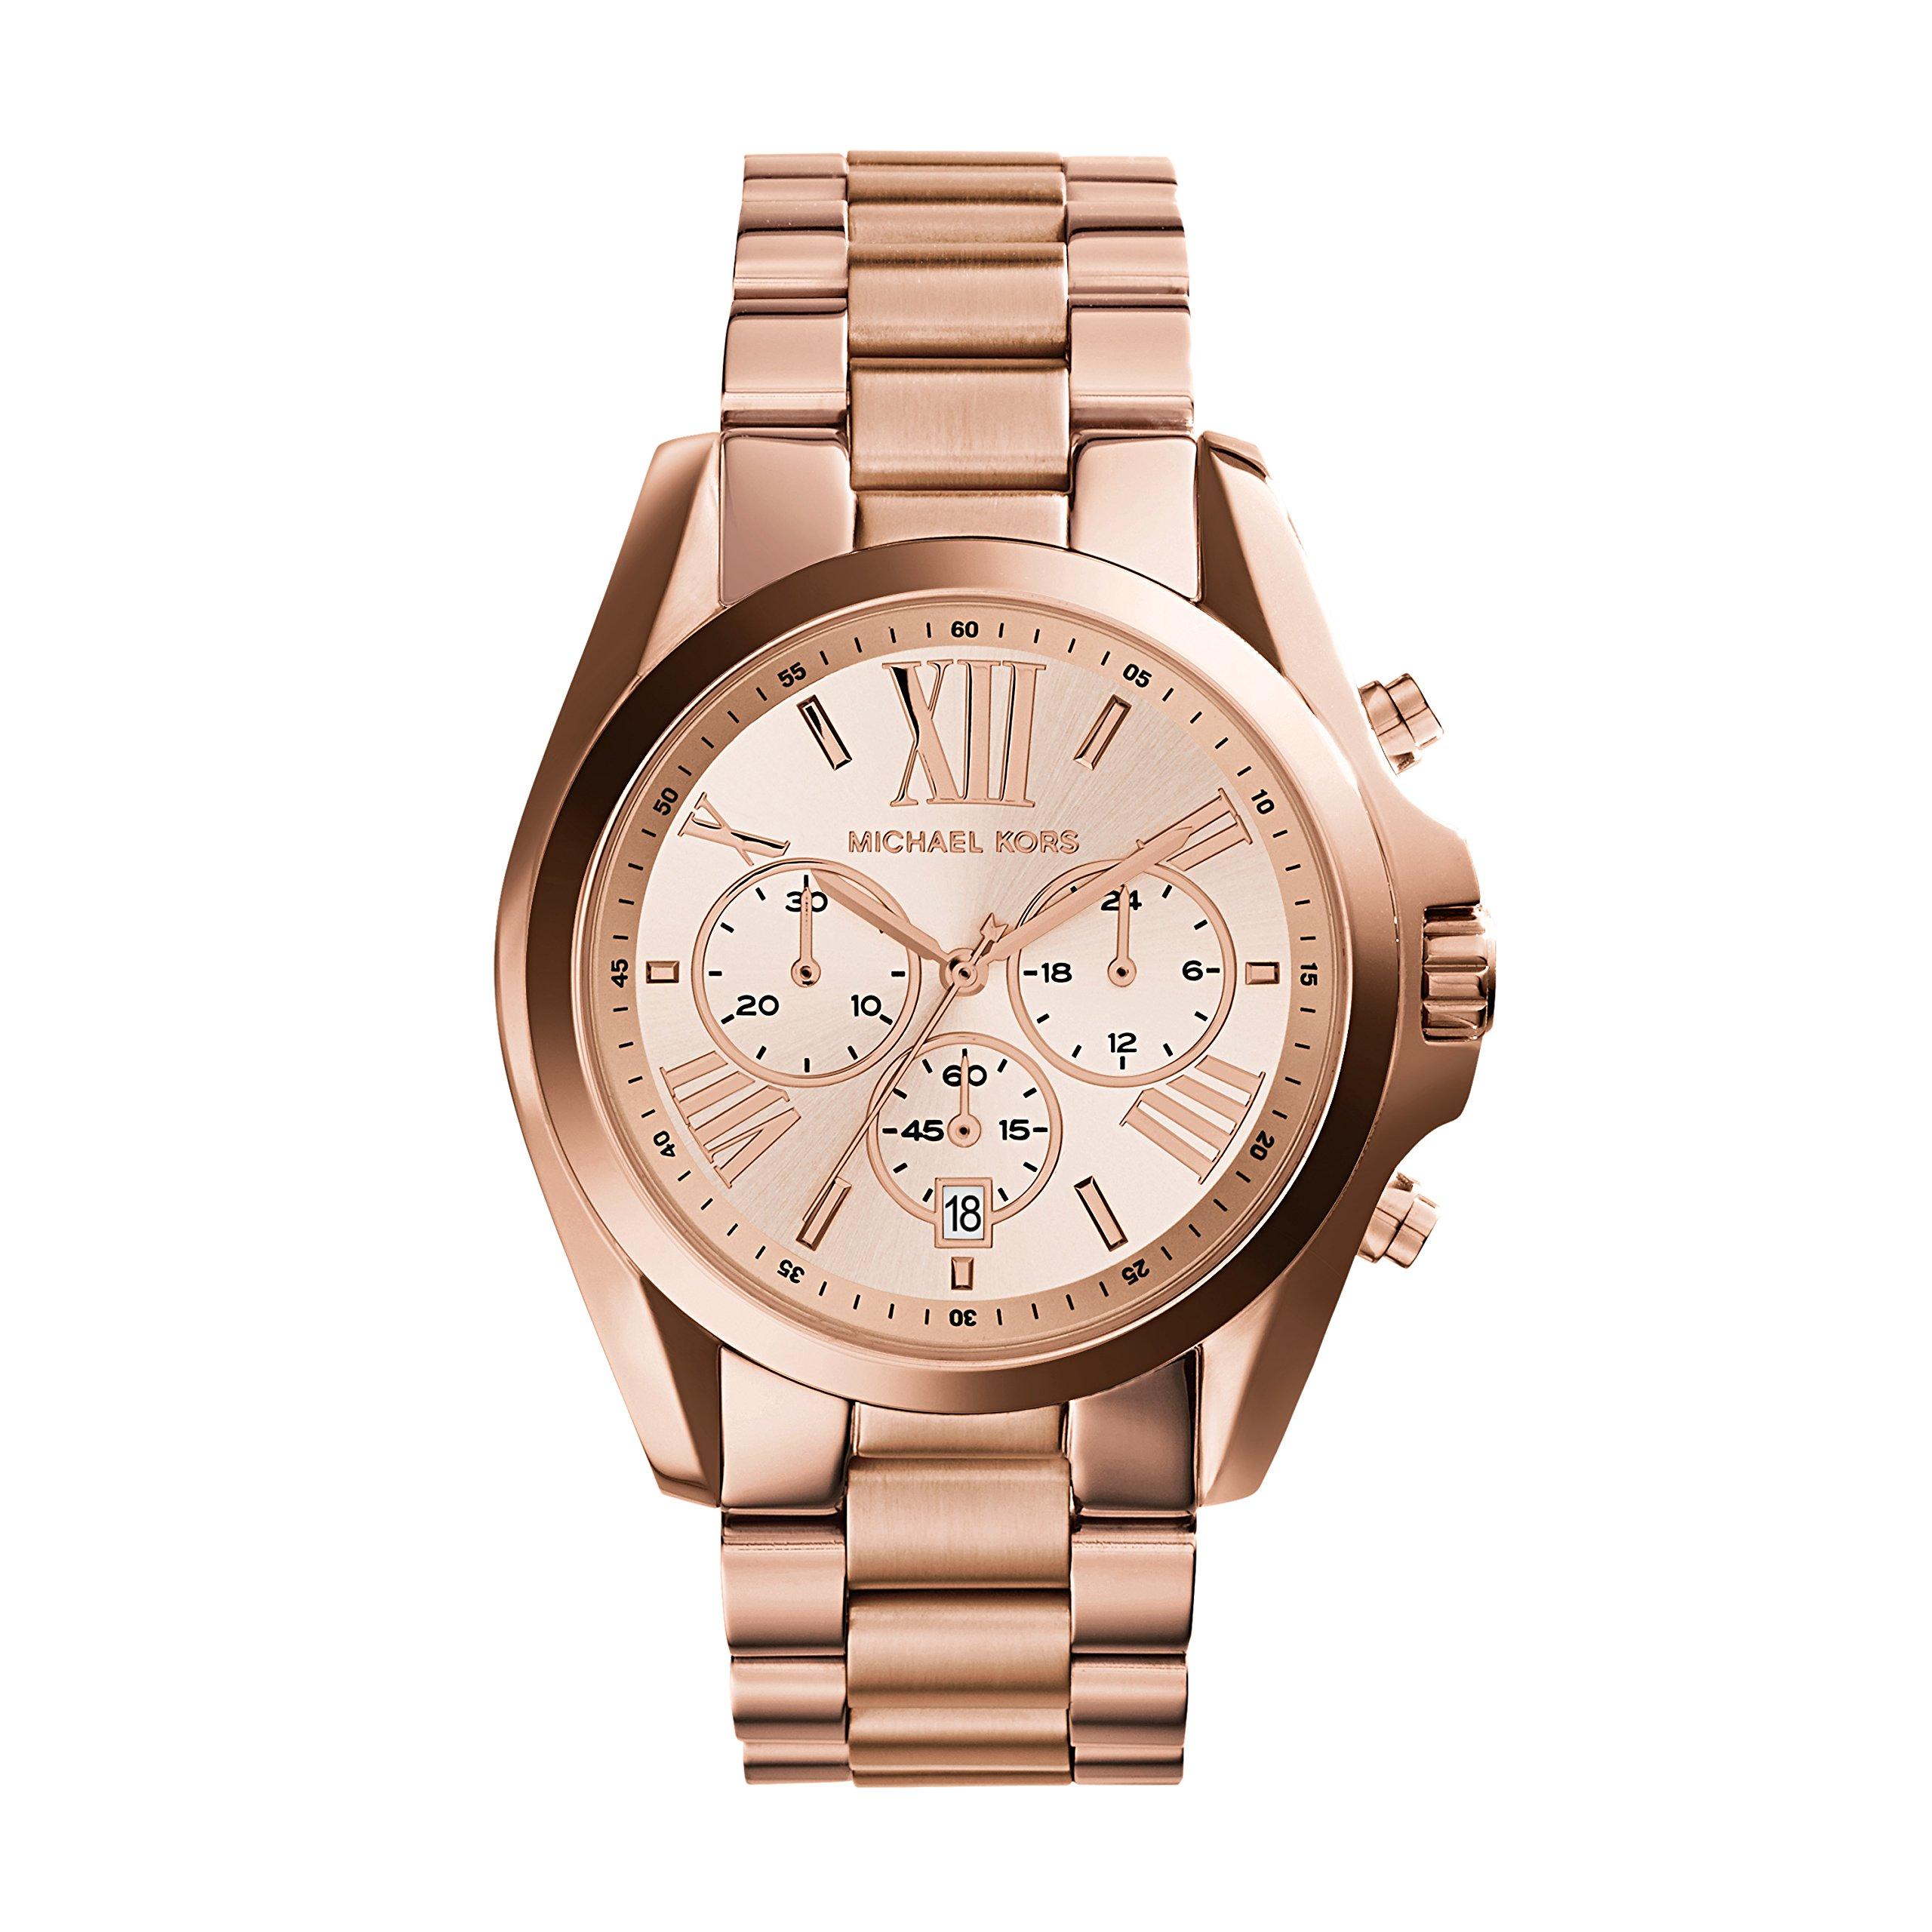 Michael Kors Roman Numeral Watch MK5503 Rose Gold by Michael Kors